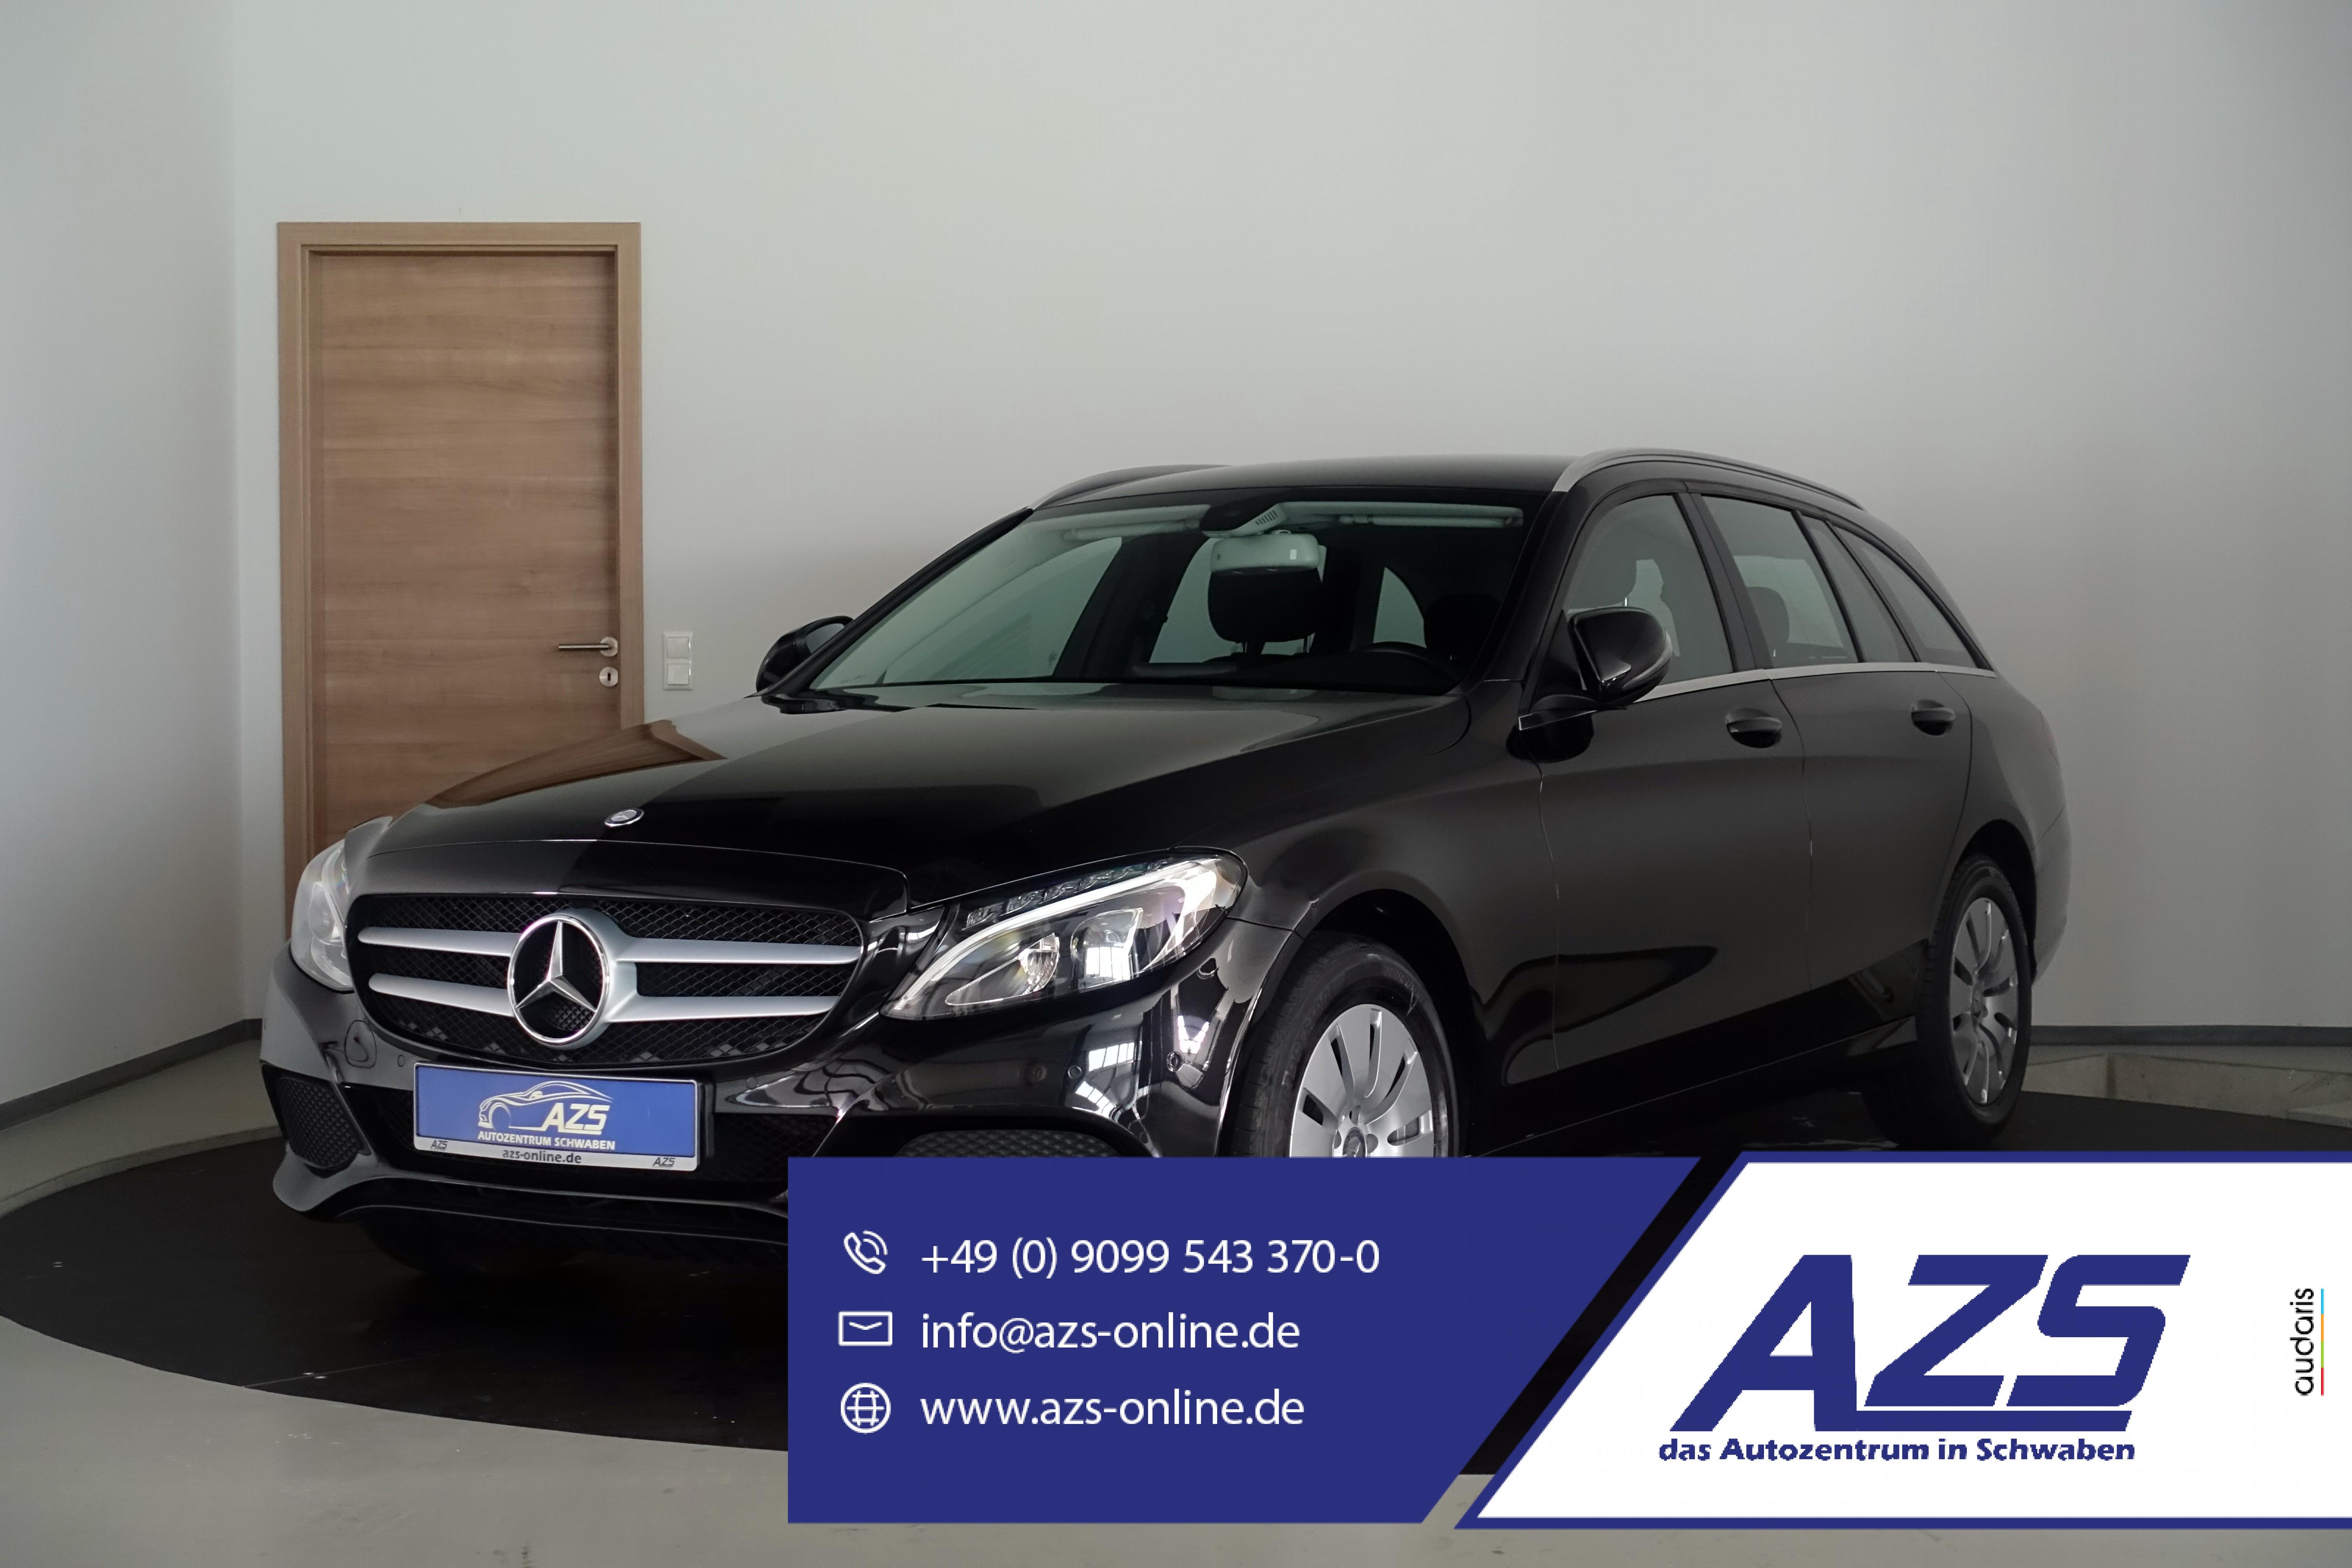 Mercedes-Benz C 180 T CDI | Navi | LED | AHK | Kamera | 2xPDC, Jahr 2015, Diesel